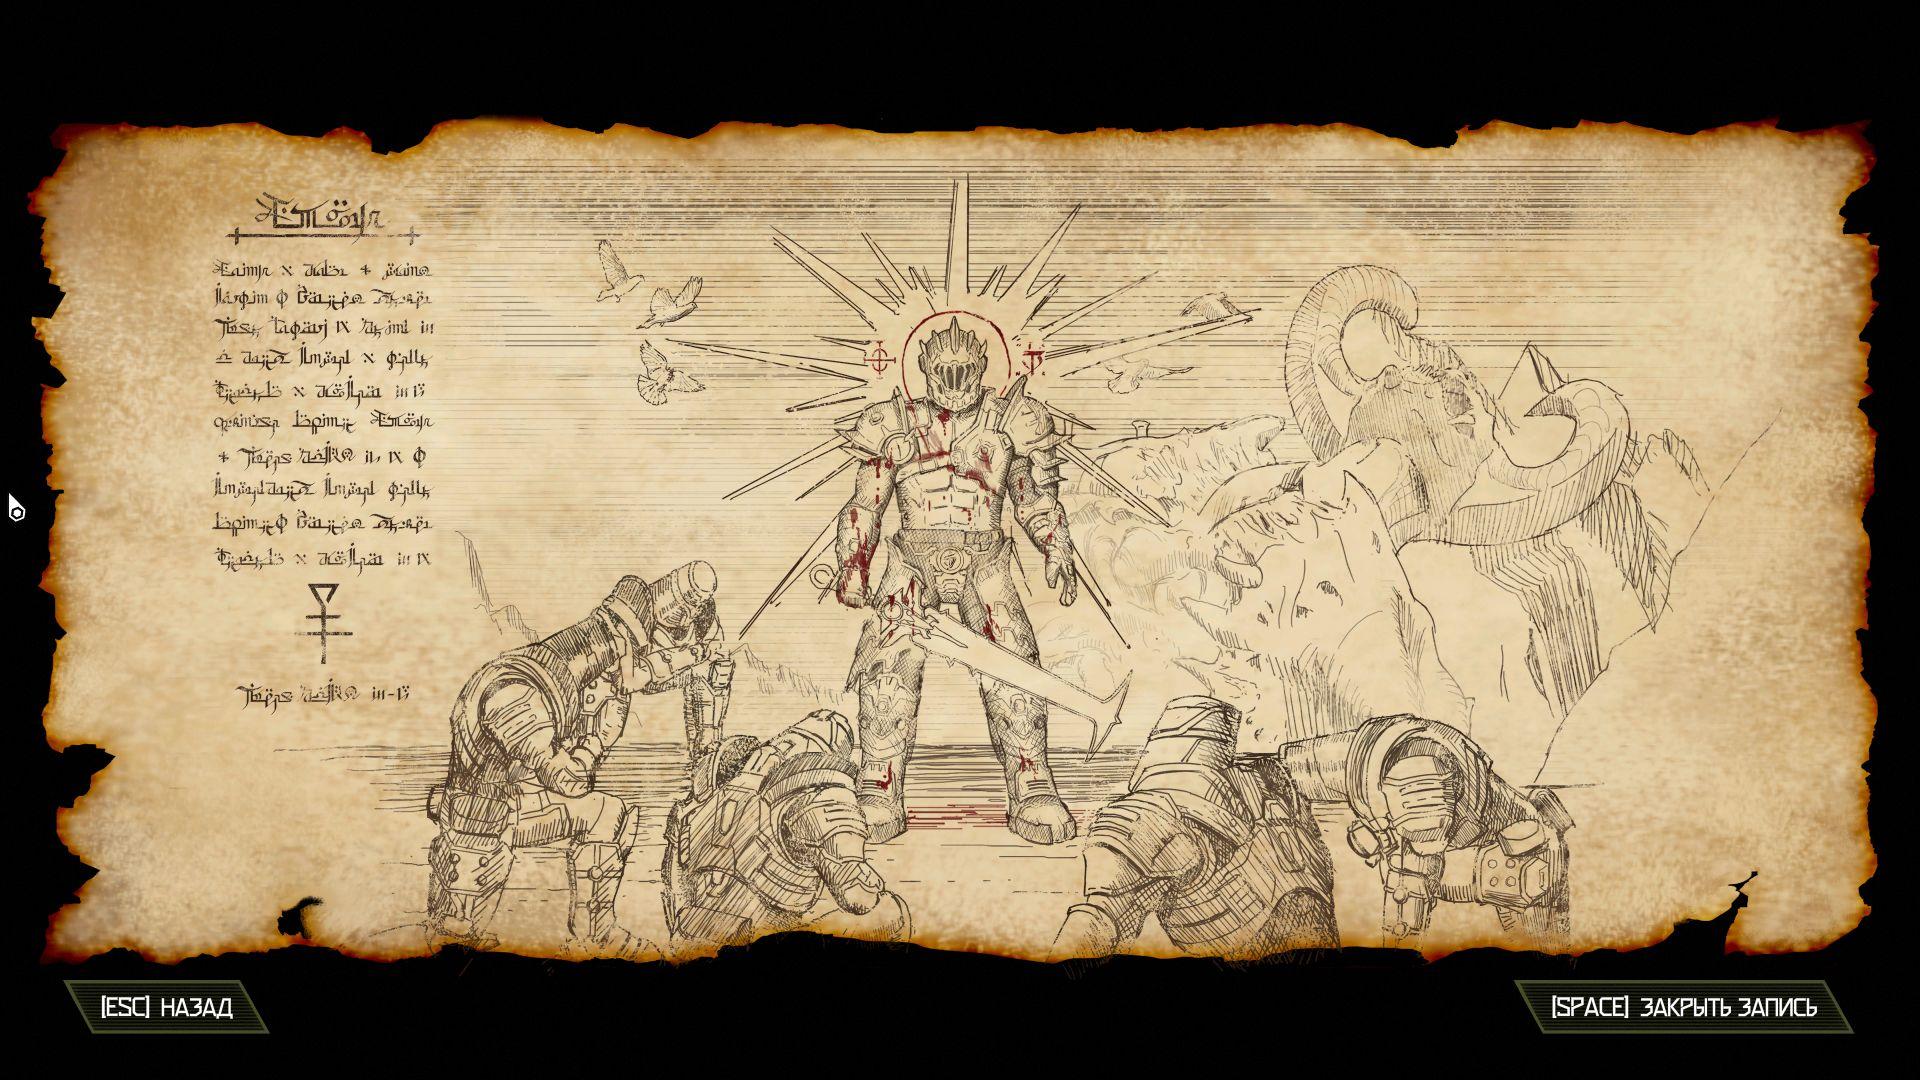 000151.Jpg - Doom Eternal